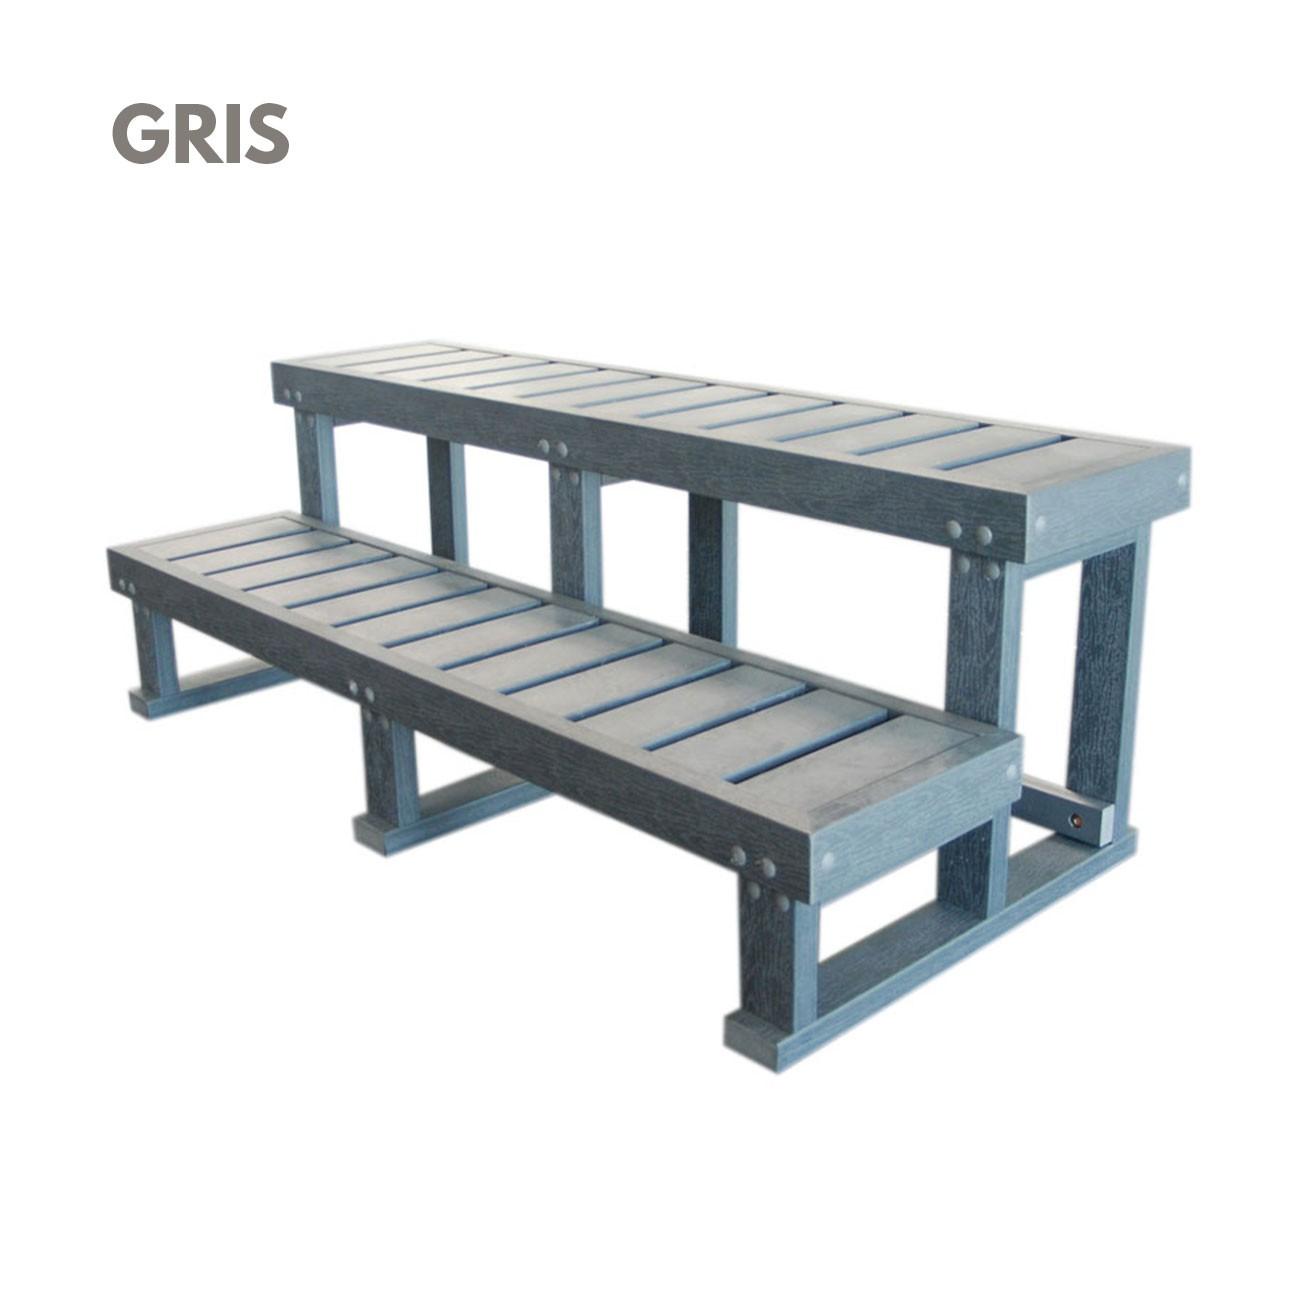 escalier extra large 2 marches spa jacuzzi bain et. Black Bedroom Furniture Sets. Home Design Ideas